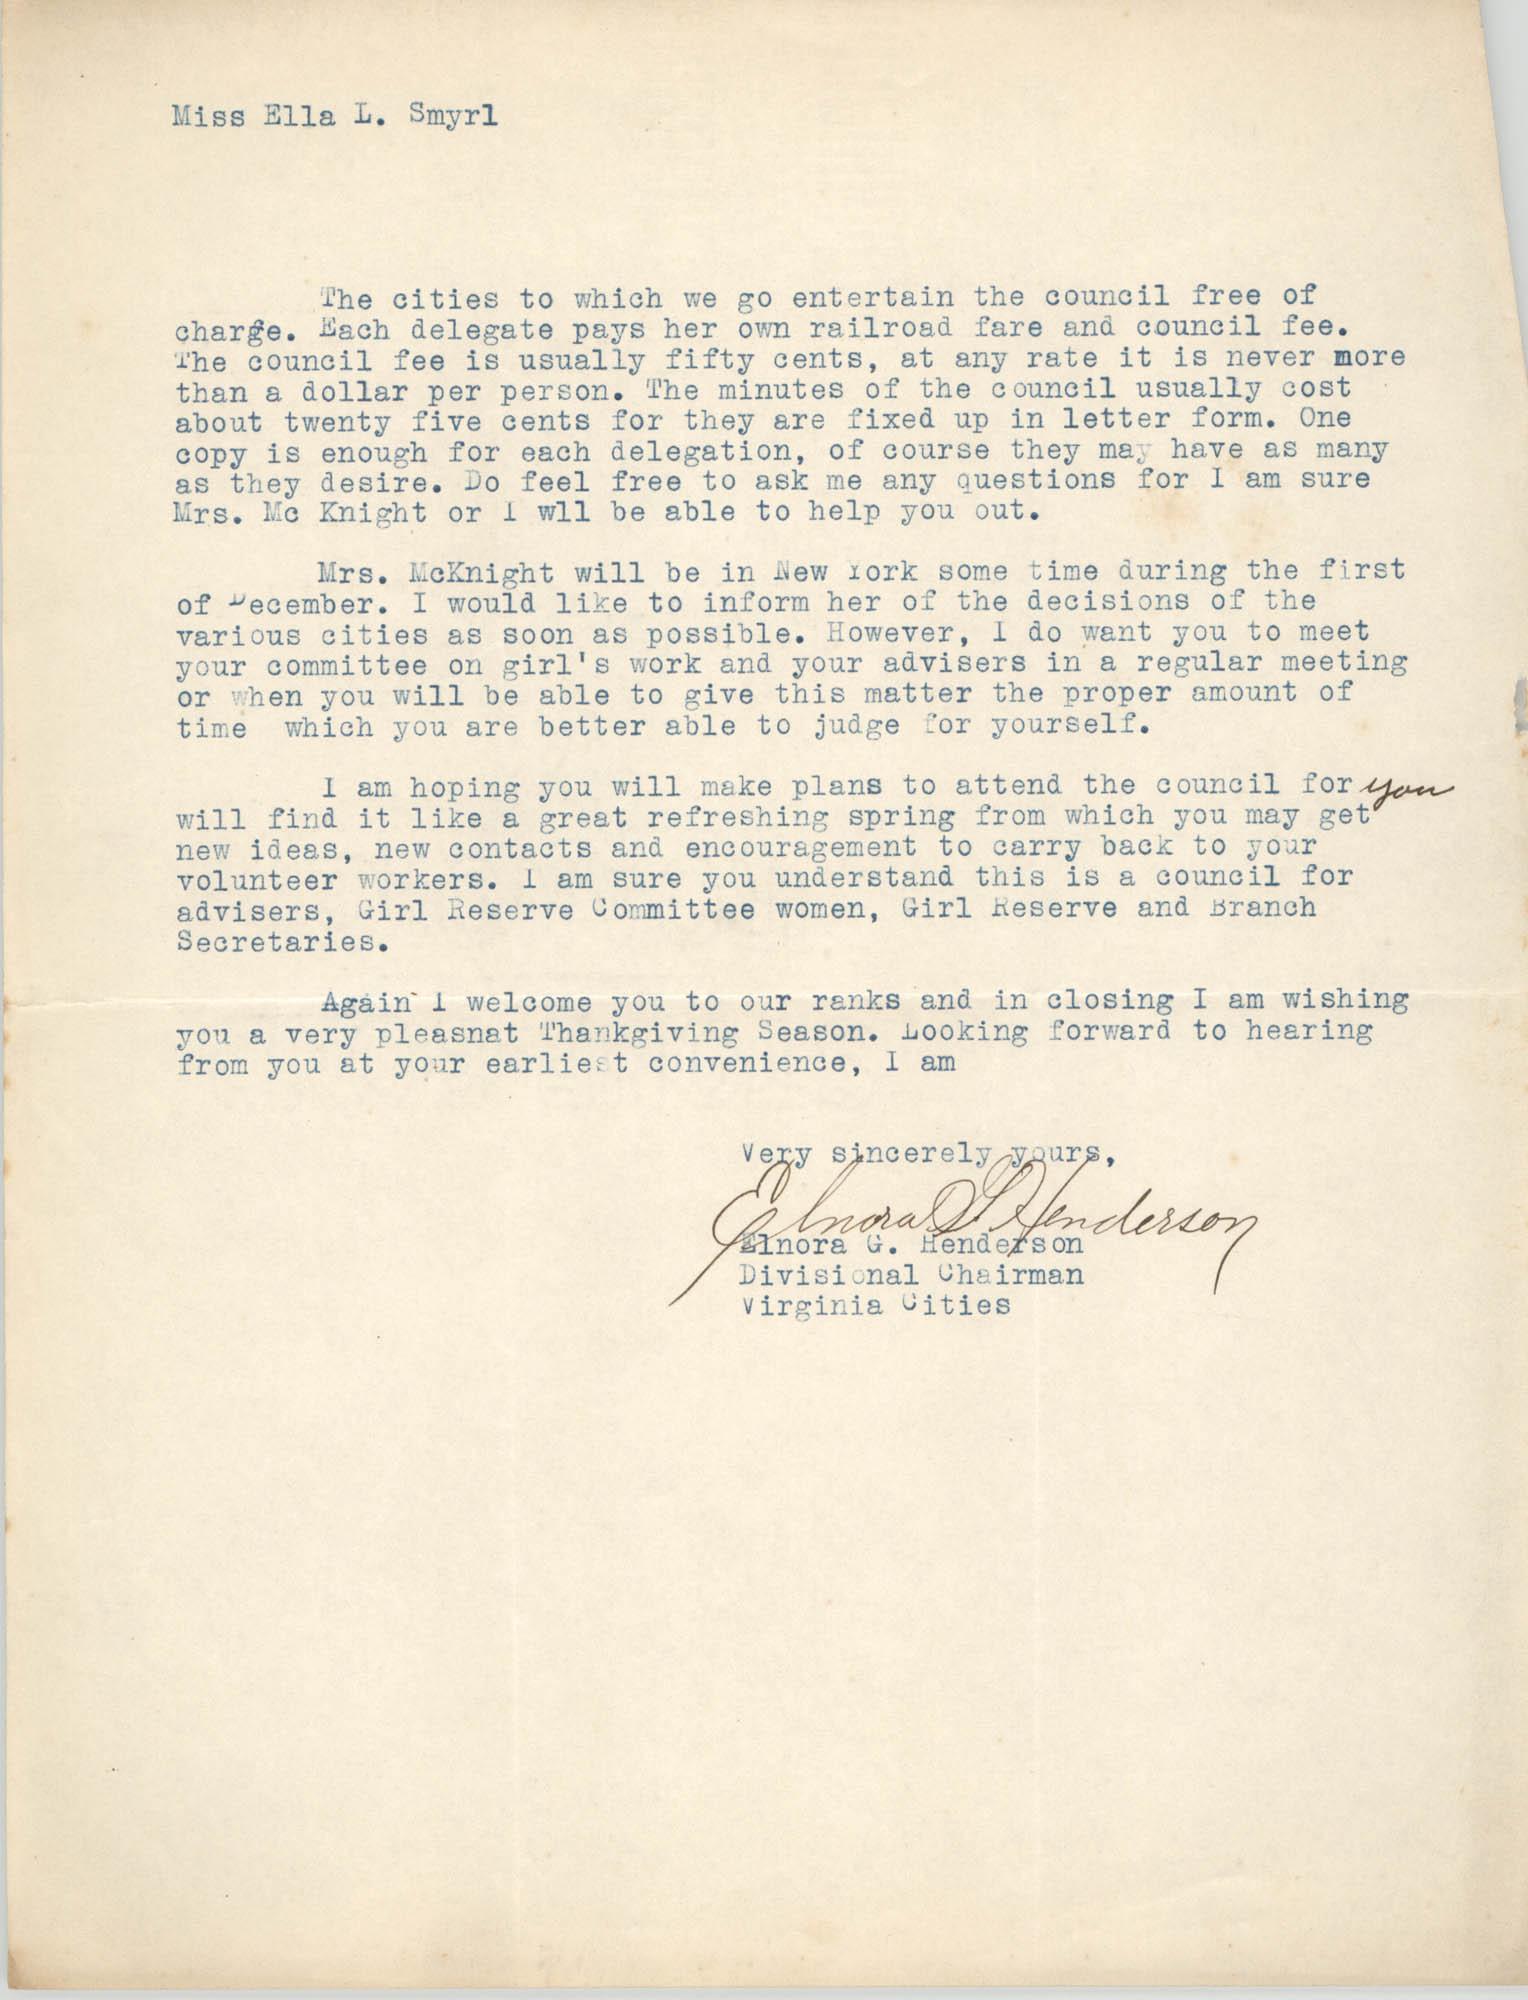 Letter from Elnora G. Henderson to Ella L. Smyrl